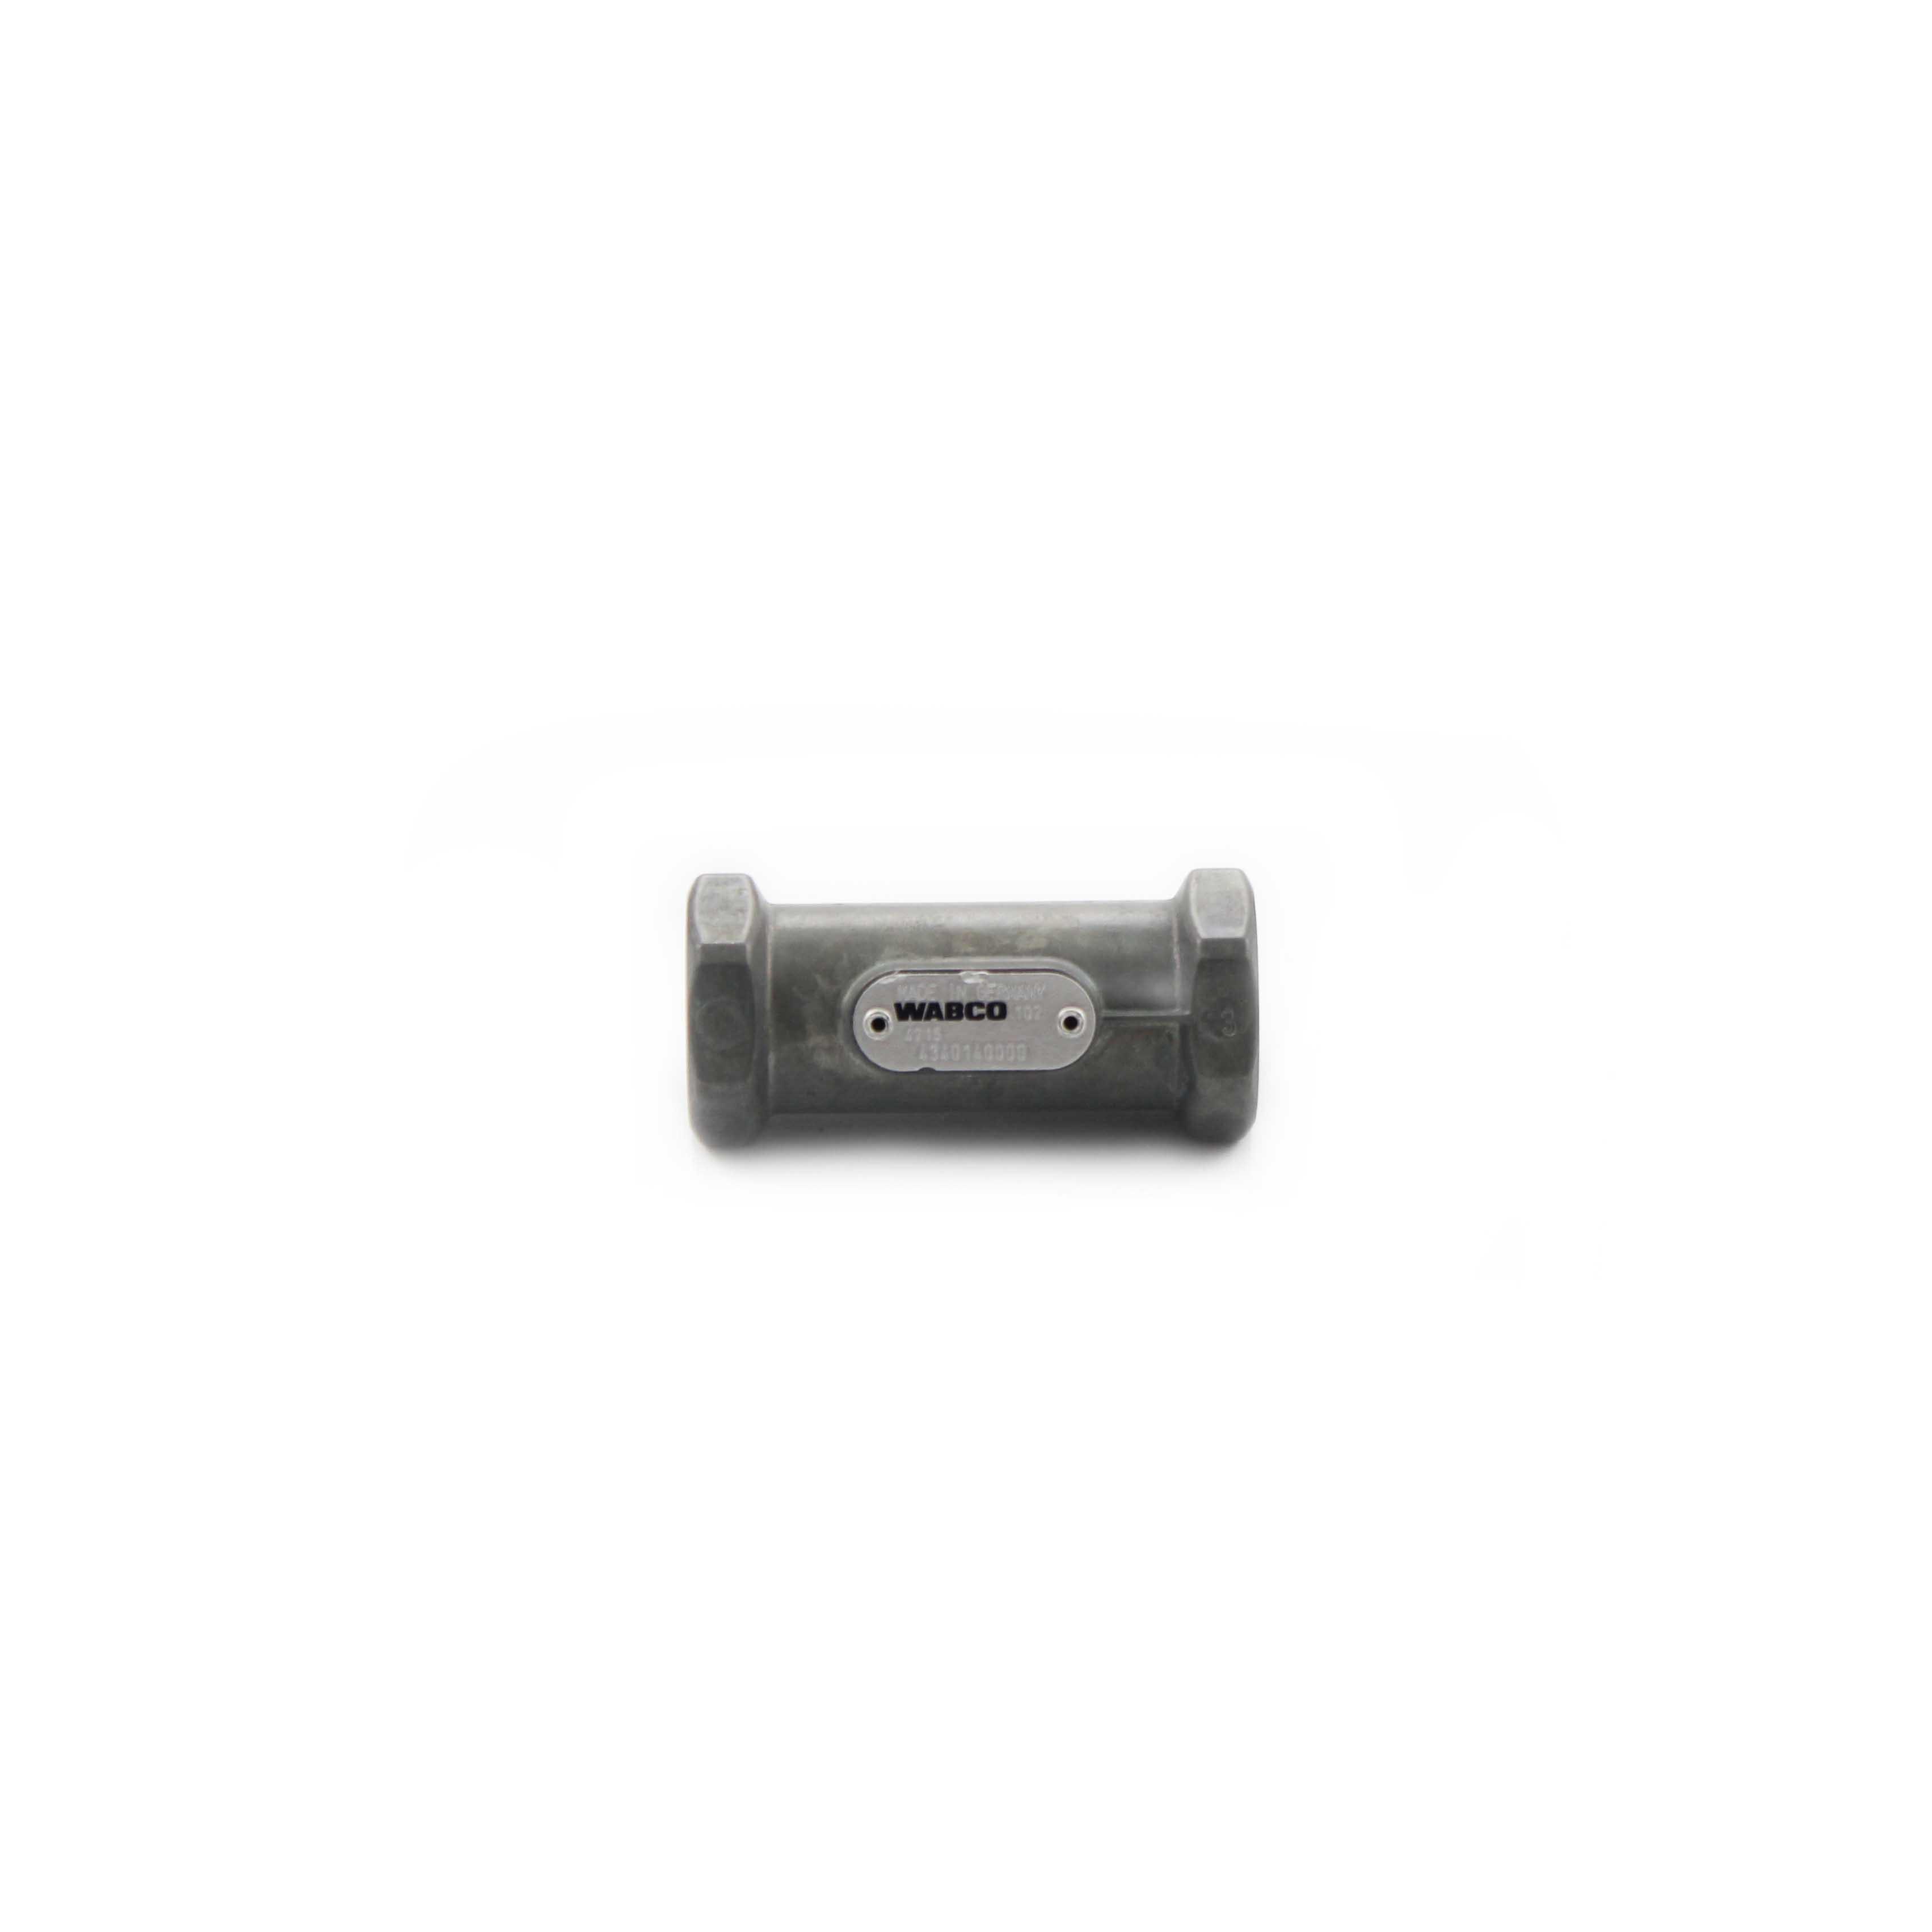 Wabco Check valve M22 - Chassis parts - Broshuis | Webshop